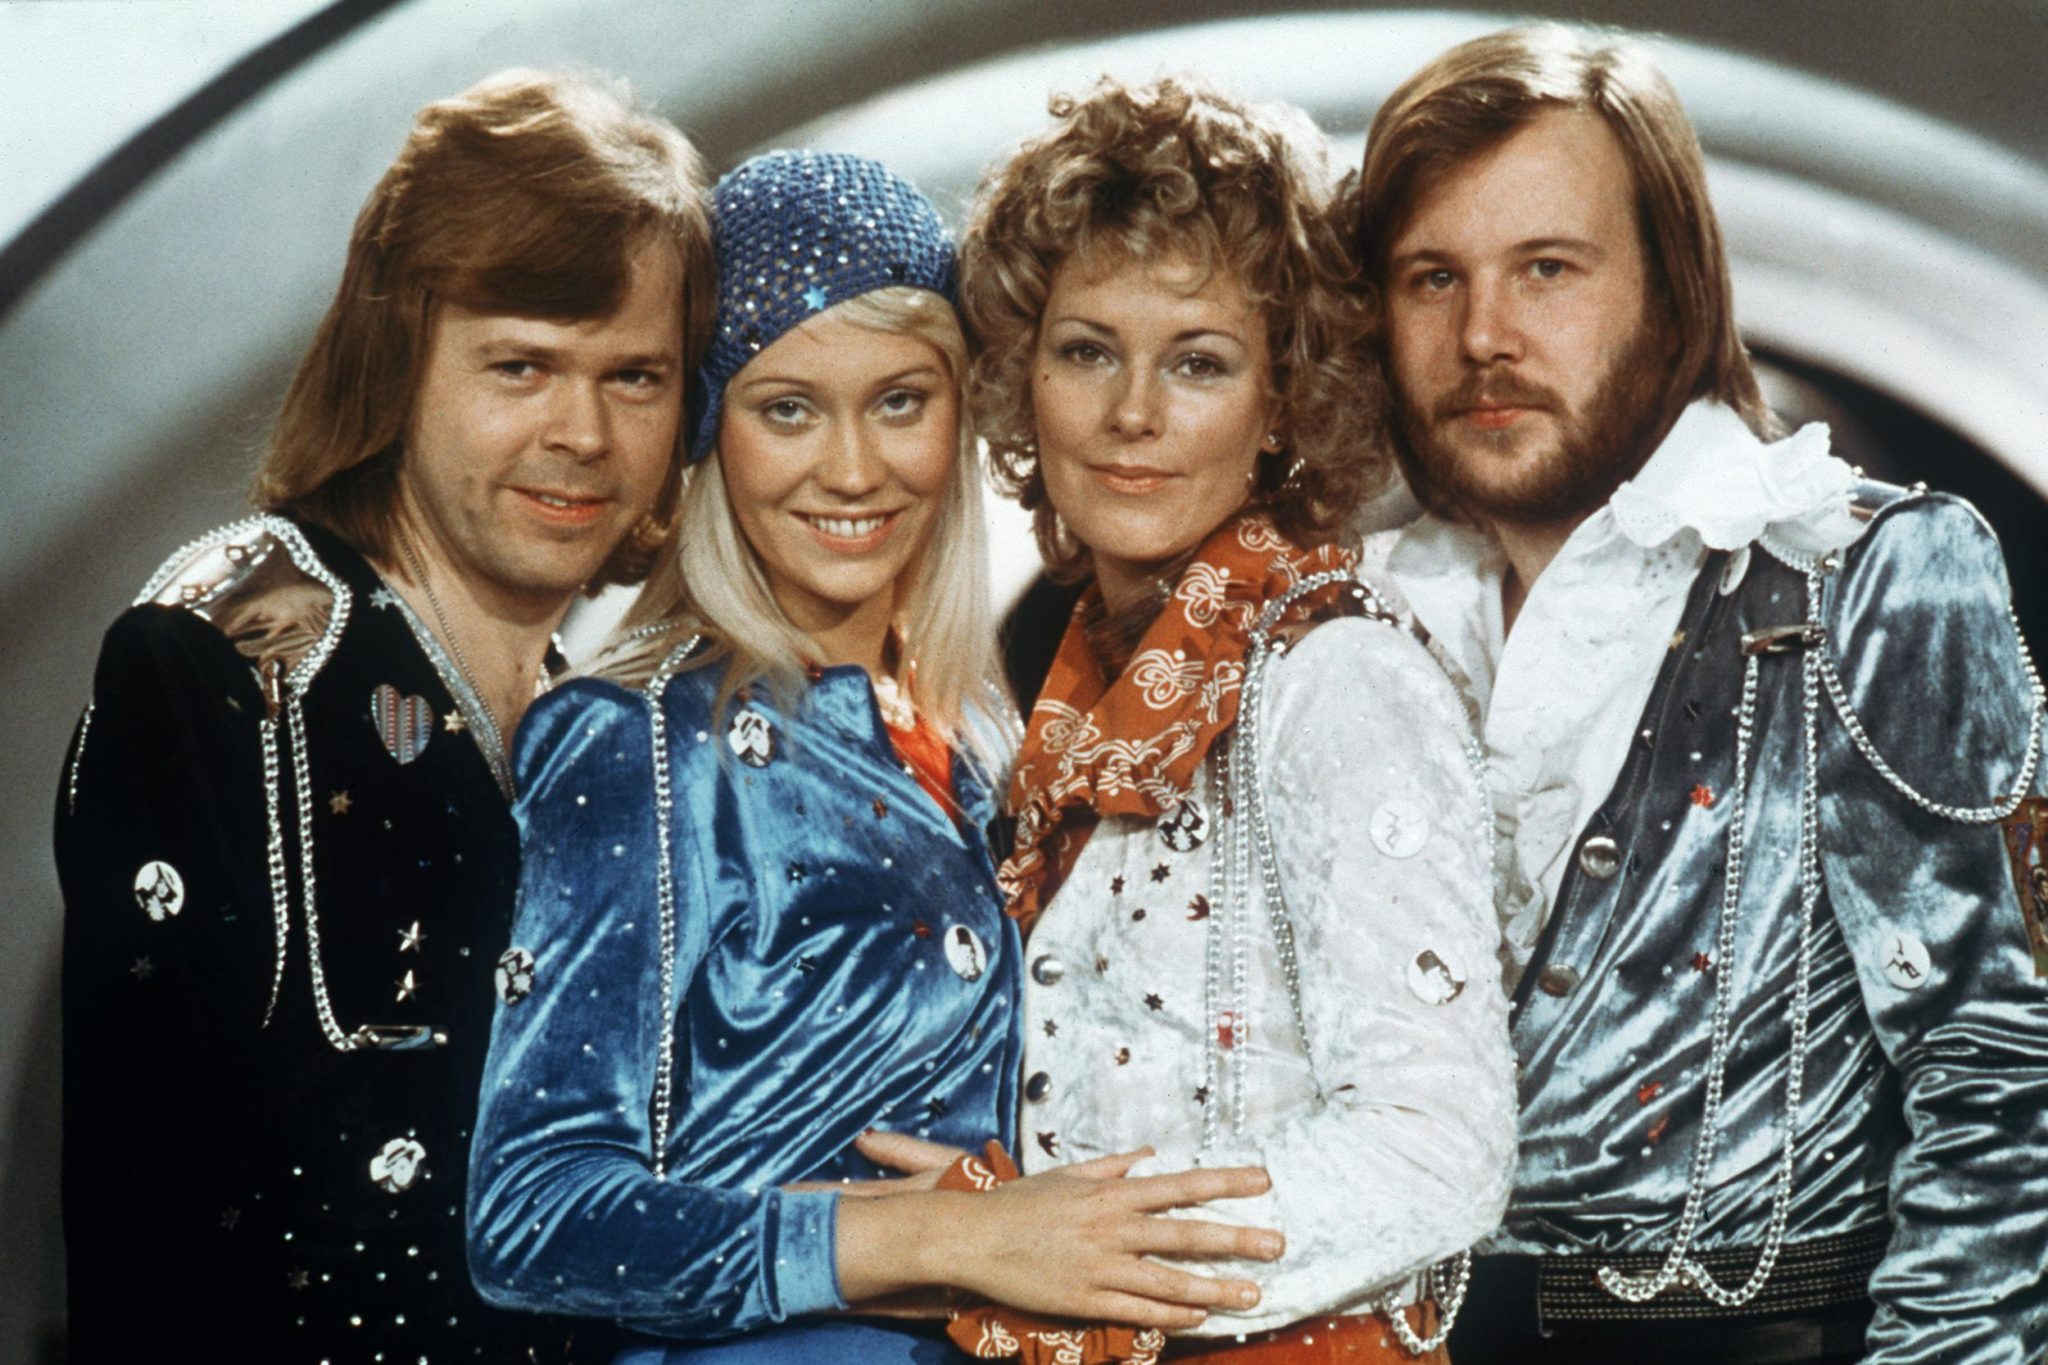 ABBA: integrantes se reunem para uma 'versão digital' do grupo. Descubra >> https://t.co/kHpHqNgFIc https://t.co/1aiBiJaA07